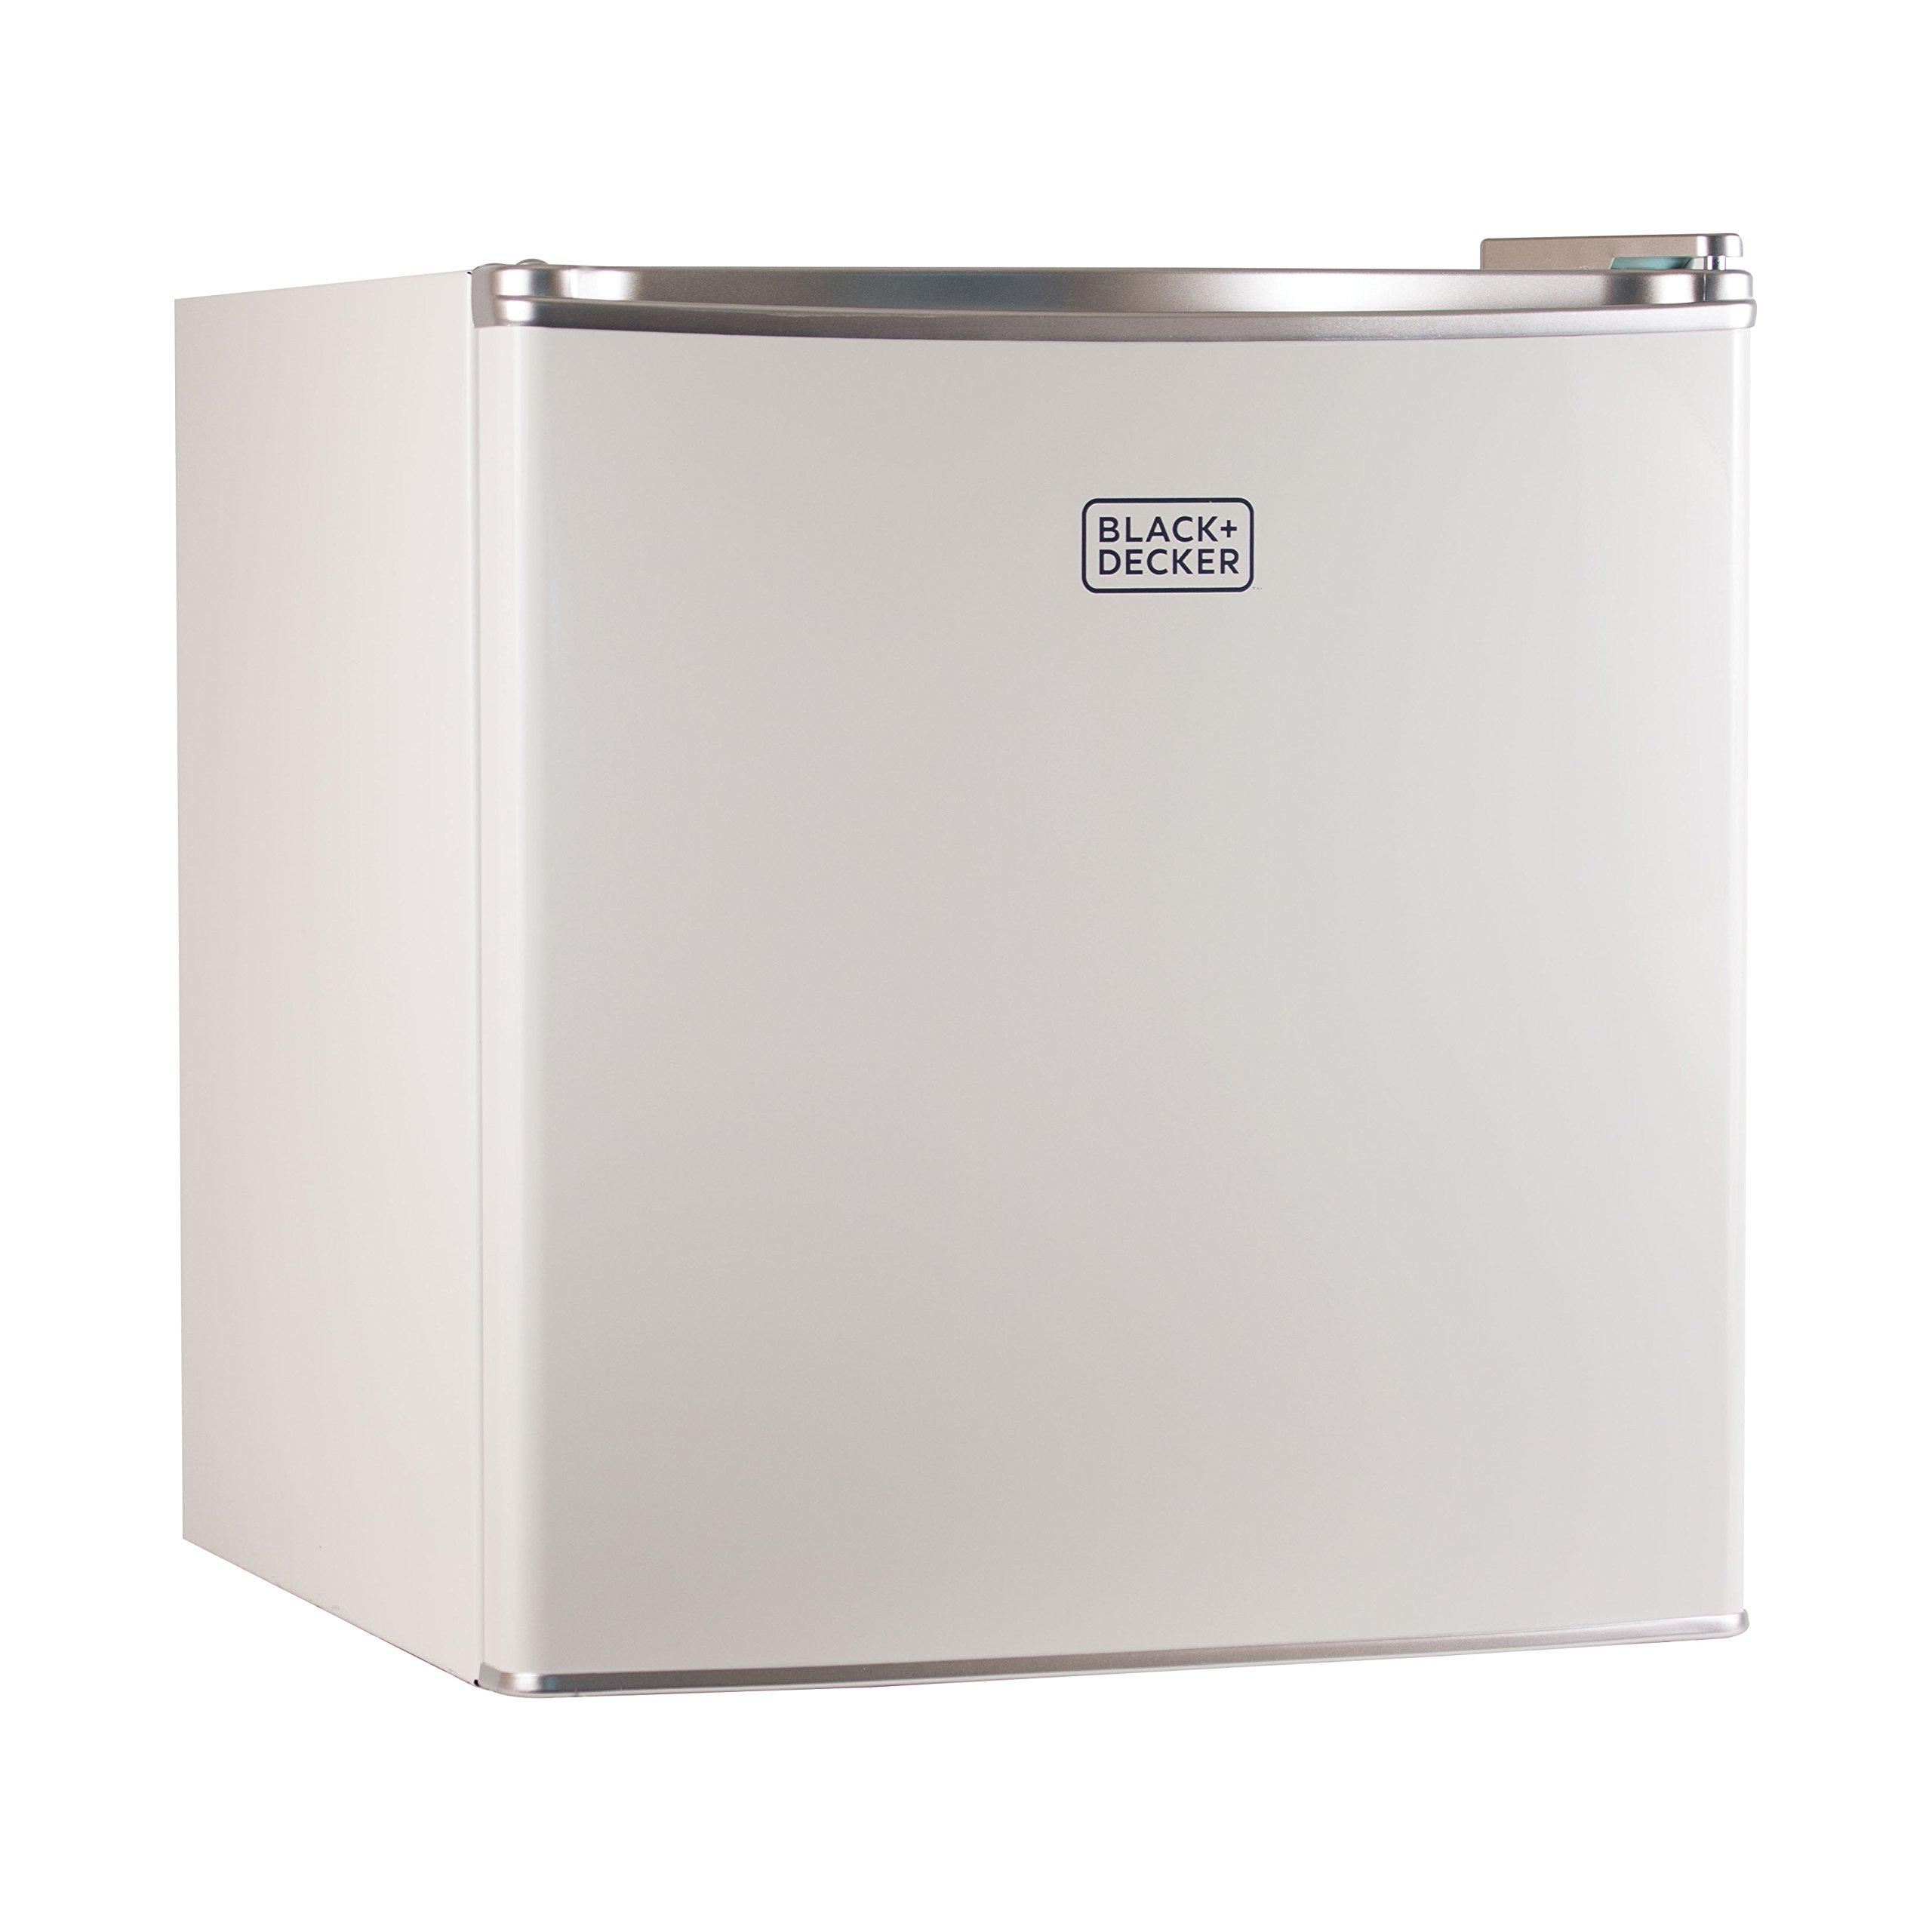 BLACK+DECKER BCRK17W Compact Refrigerator Energy Star Single Door Mini Fridge with Freezer, 1.7 Cubic Ft., White by BLACK+DECKER